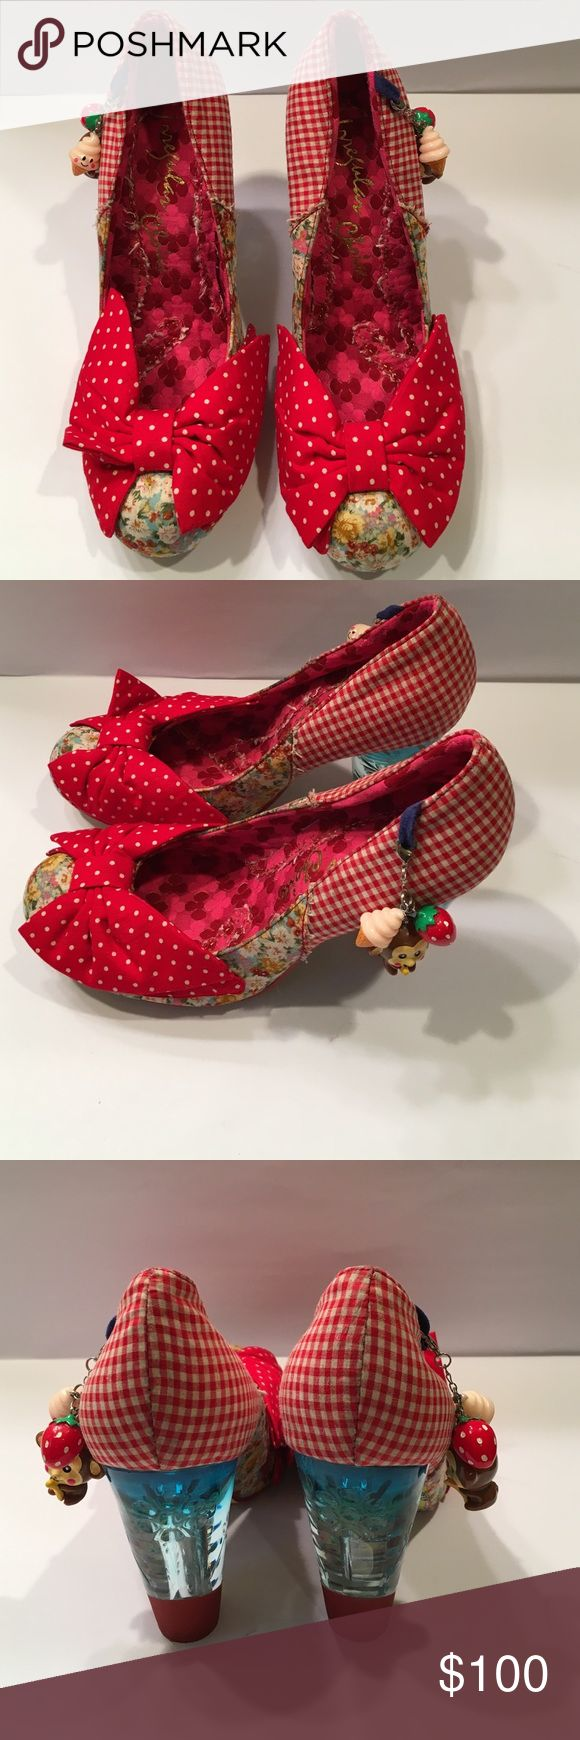 Irregular Choice heels size 40.5 Red Irregular Choice heels size 40.5 with monkey, ice cream, and strawberry charm crystal blue heels Irregular Choice Shoes Heels